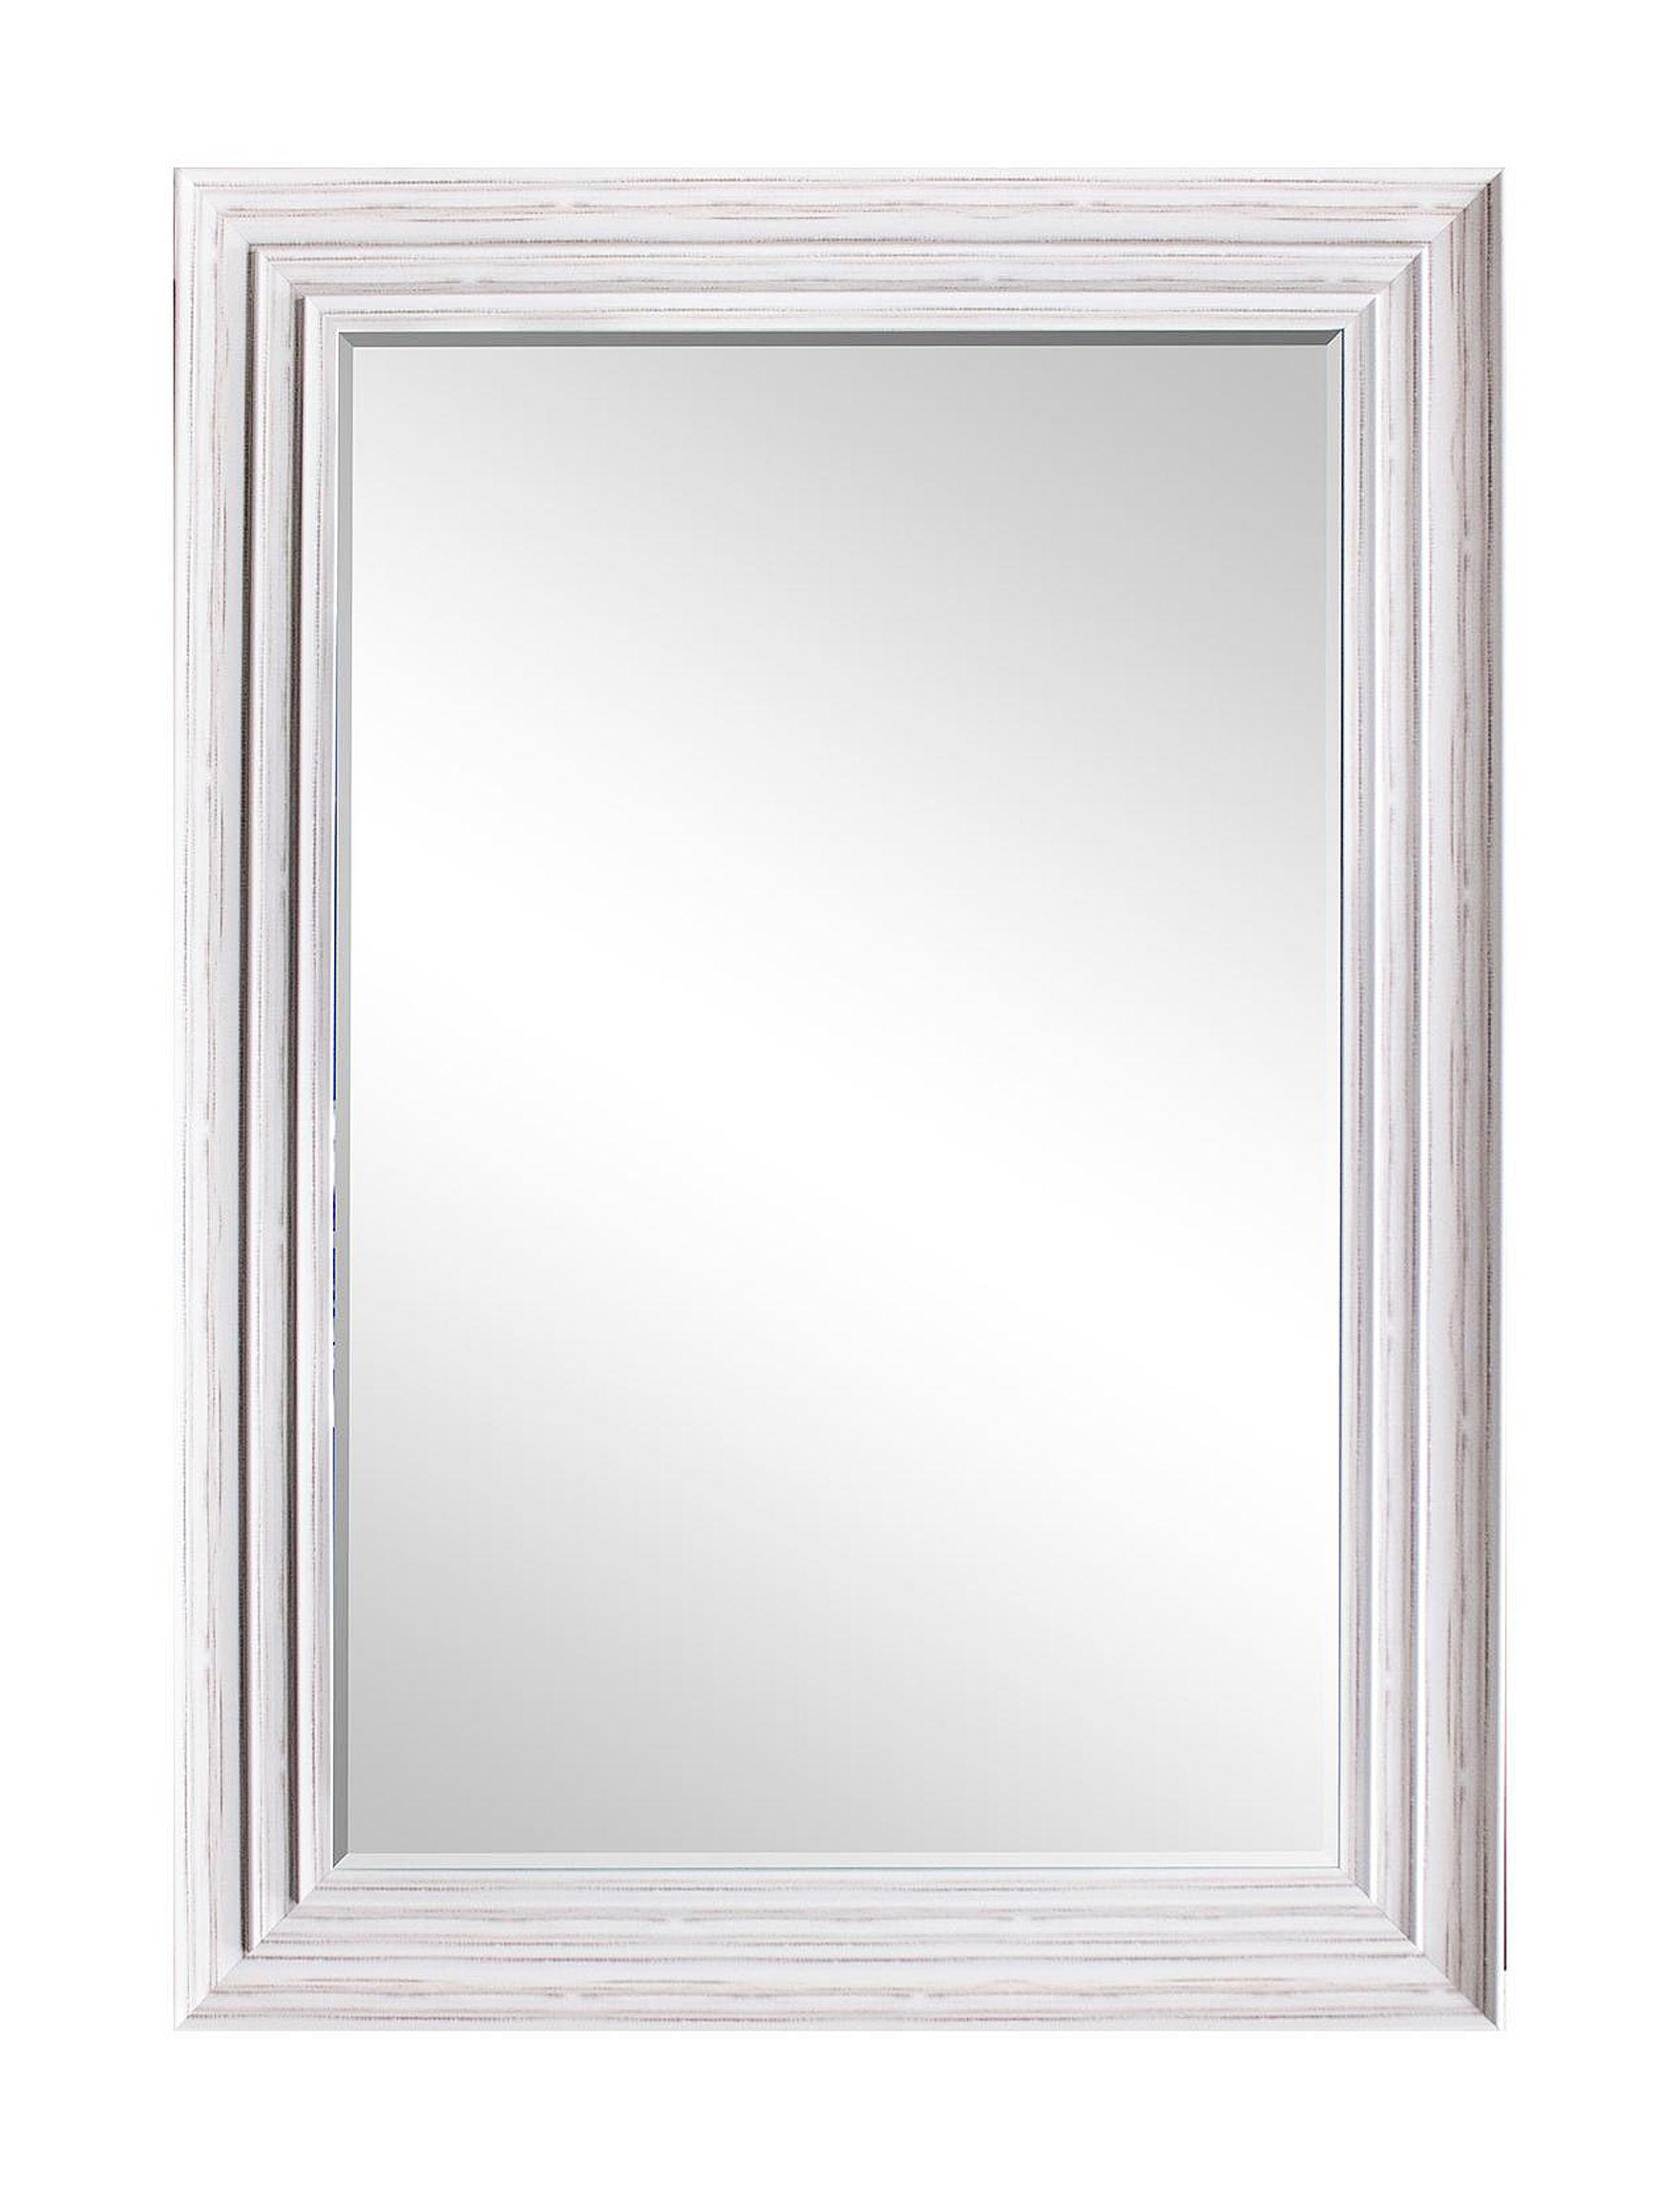 BP Industries White Mirrors Wall Decor